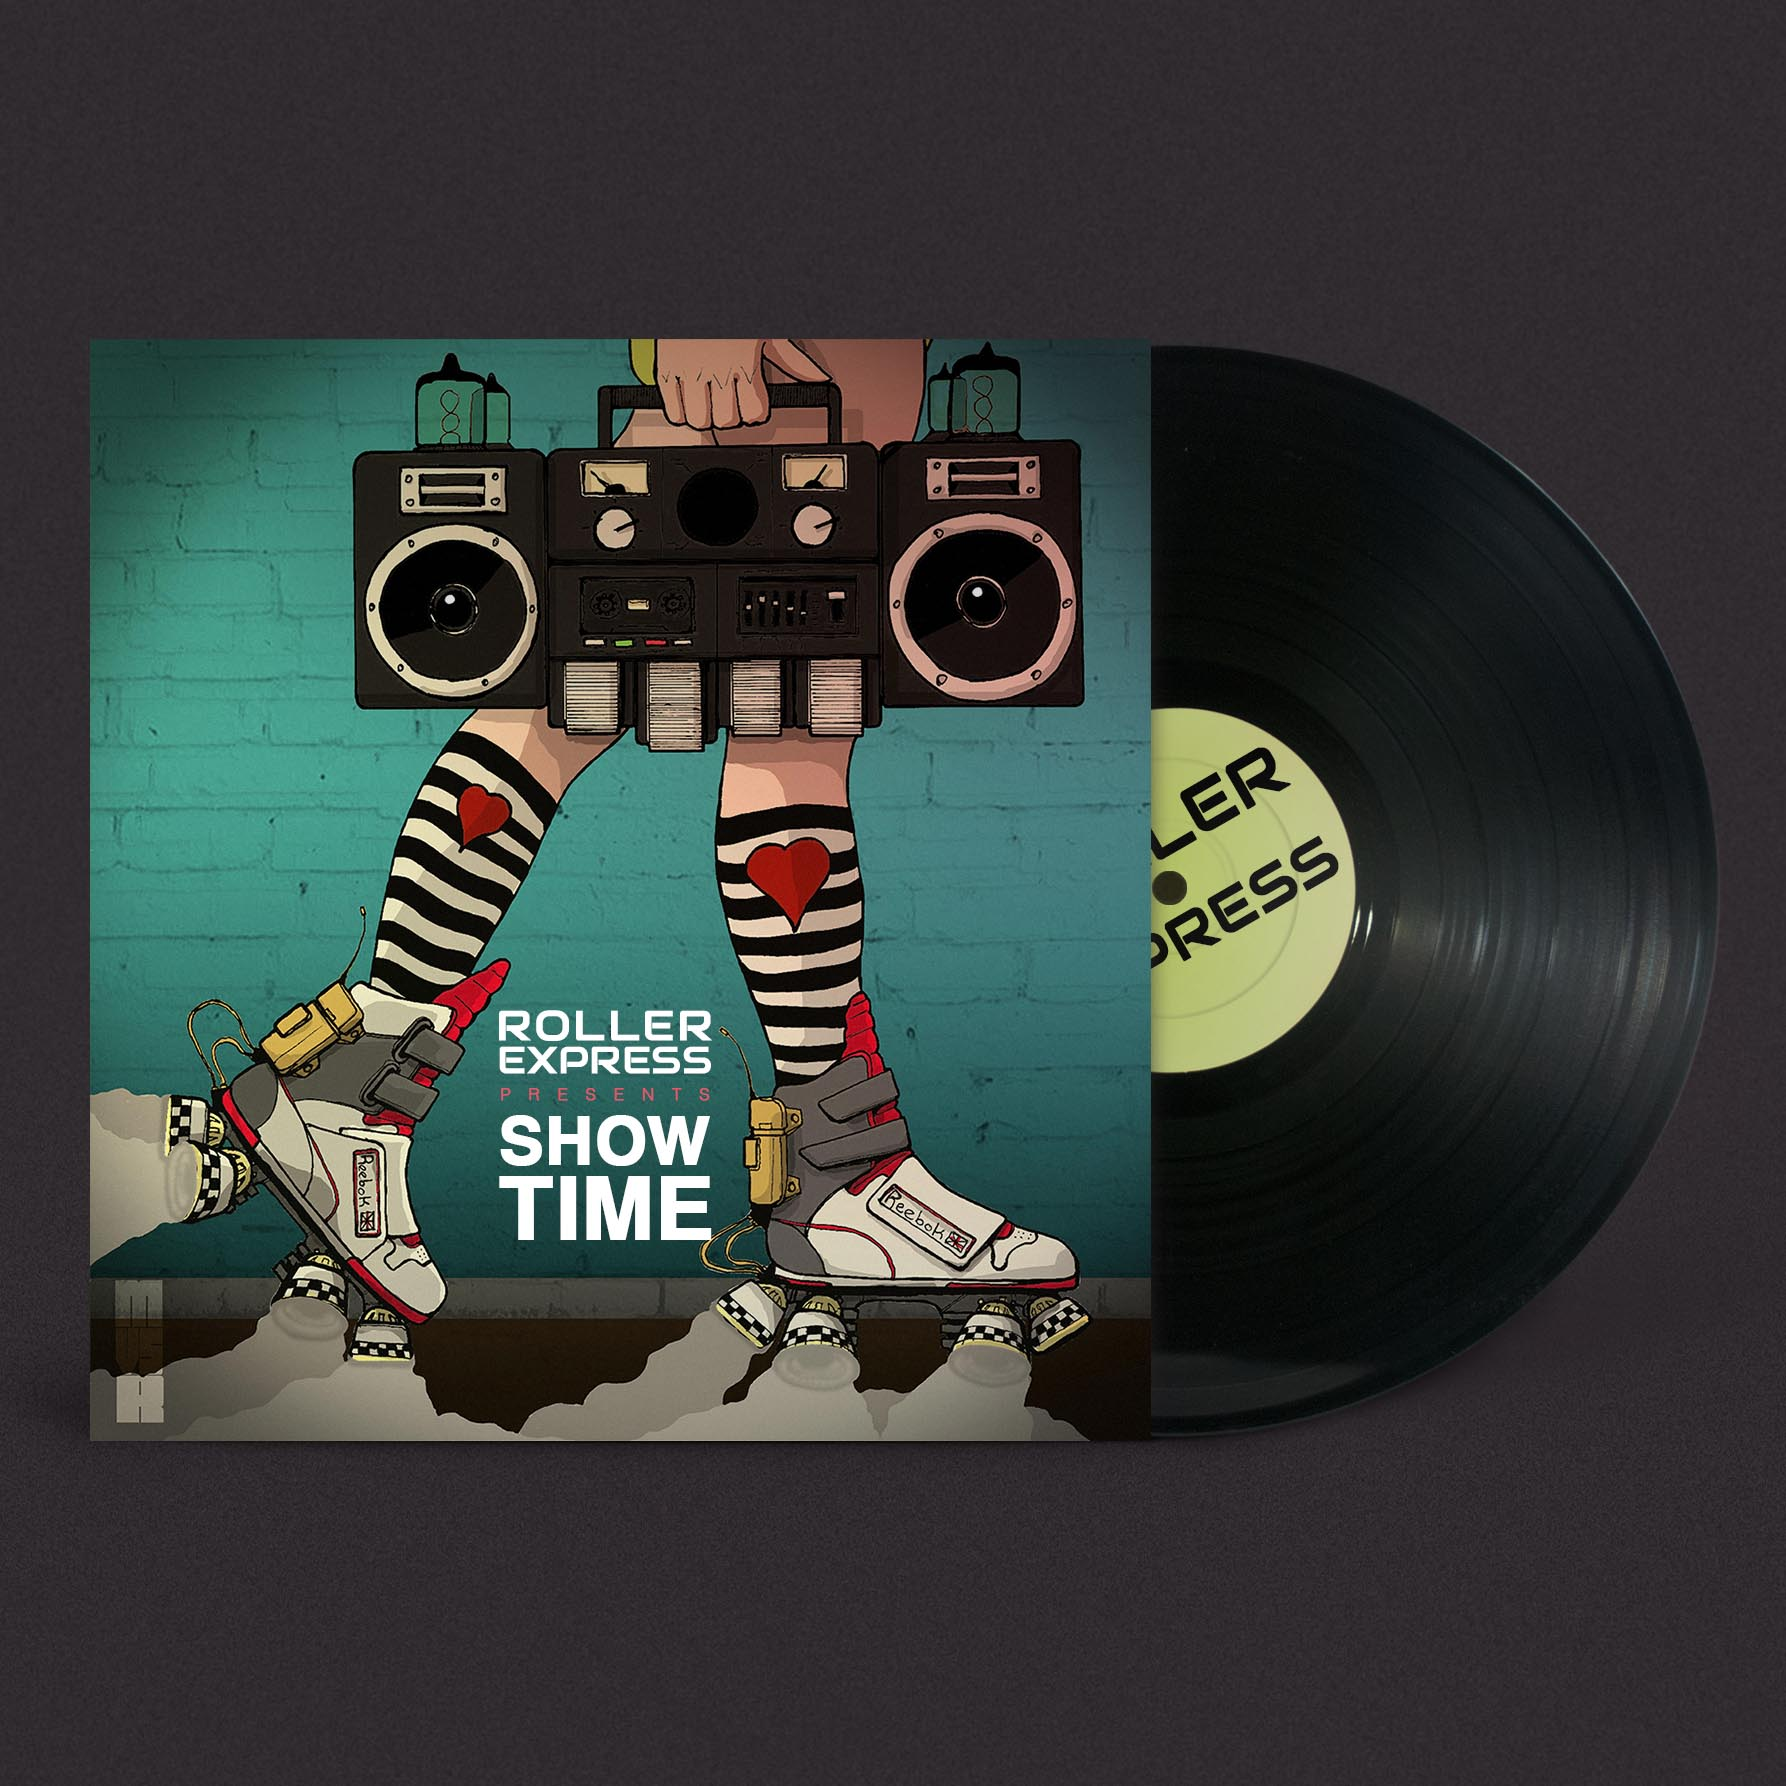 ROLLER SHOWTIME - 12Album-Cover copy.jpg